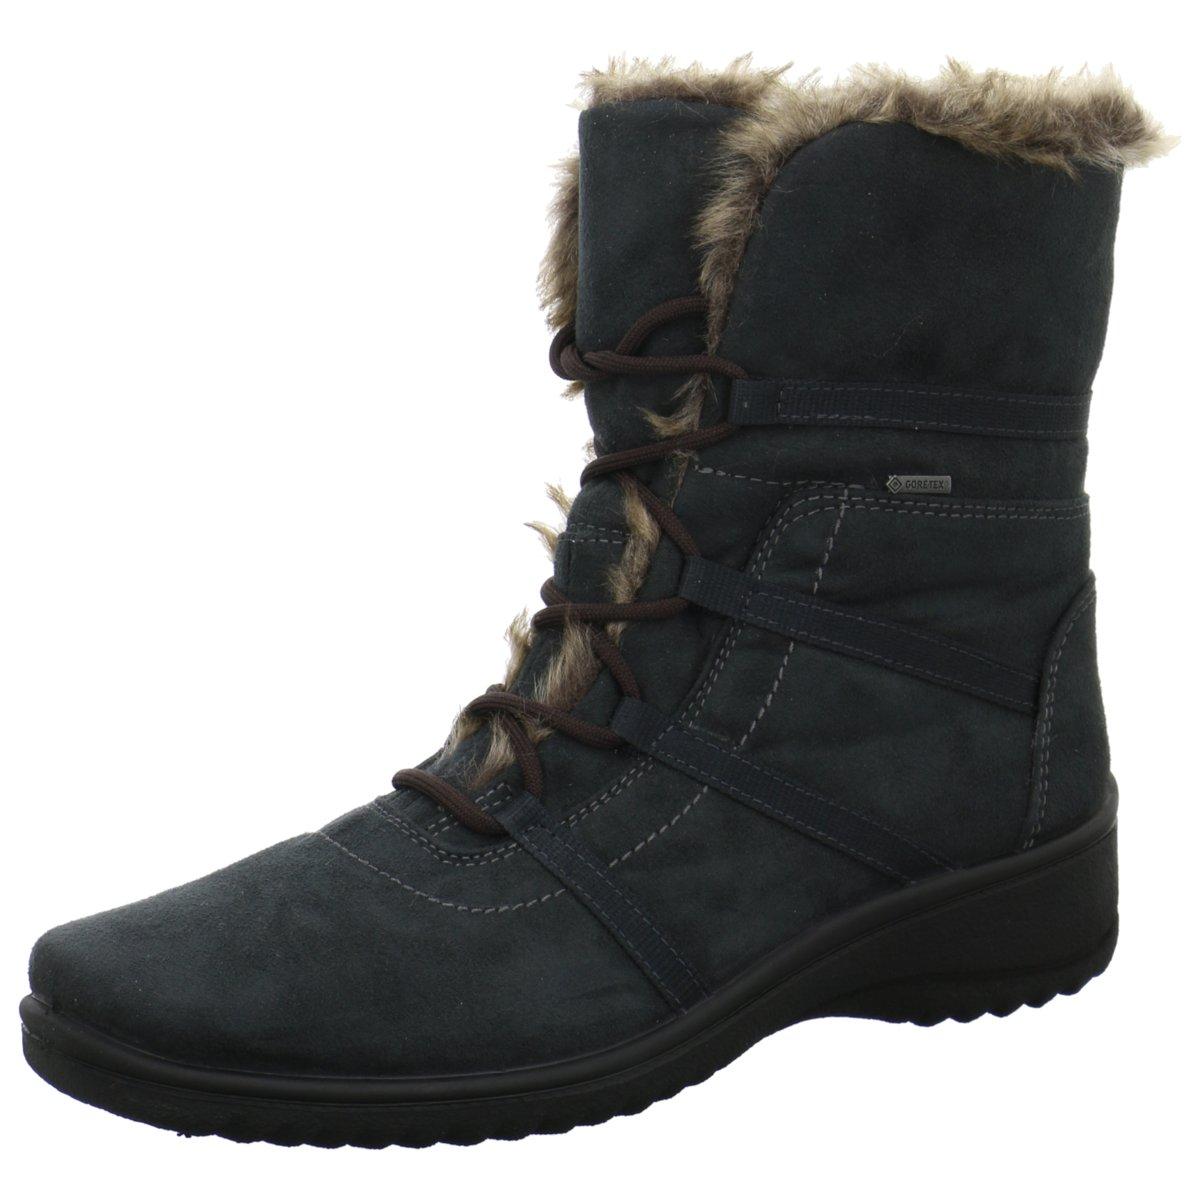 Damen Stiefel schwarz 90691 Schwarz DISCOMIX D GEOX